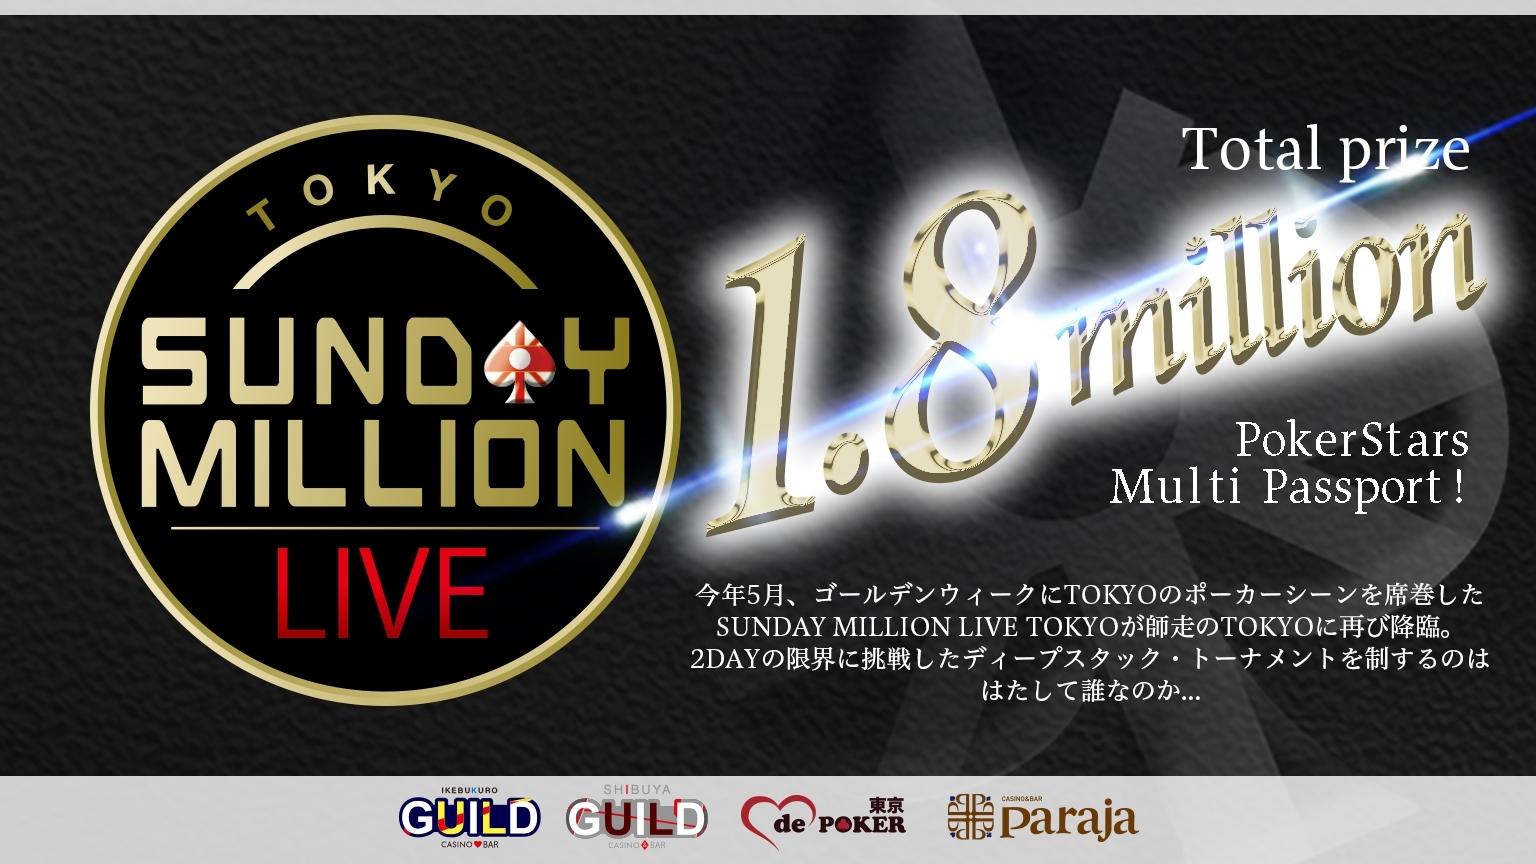 SUNDAY MILLION LIVE TOKYO